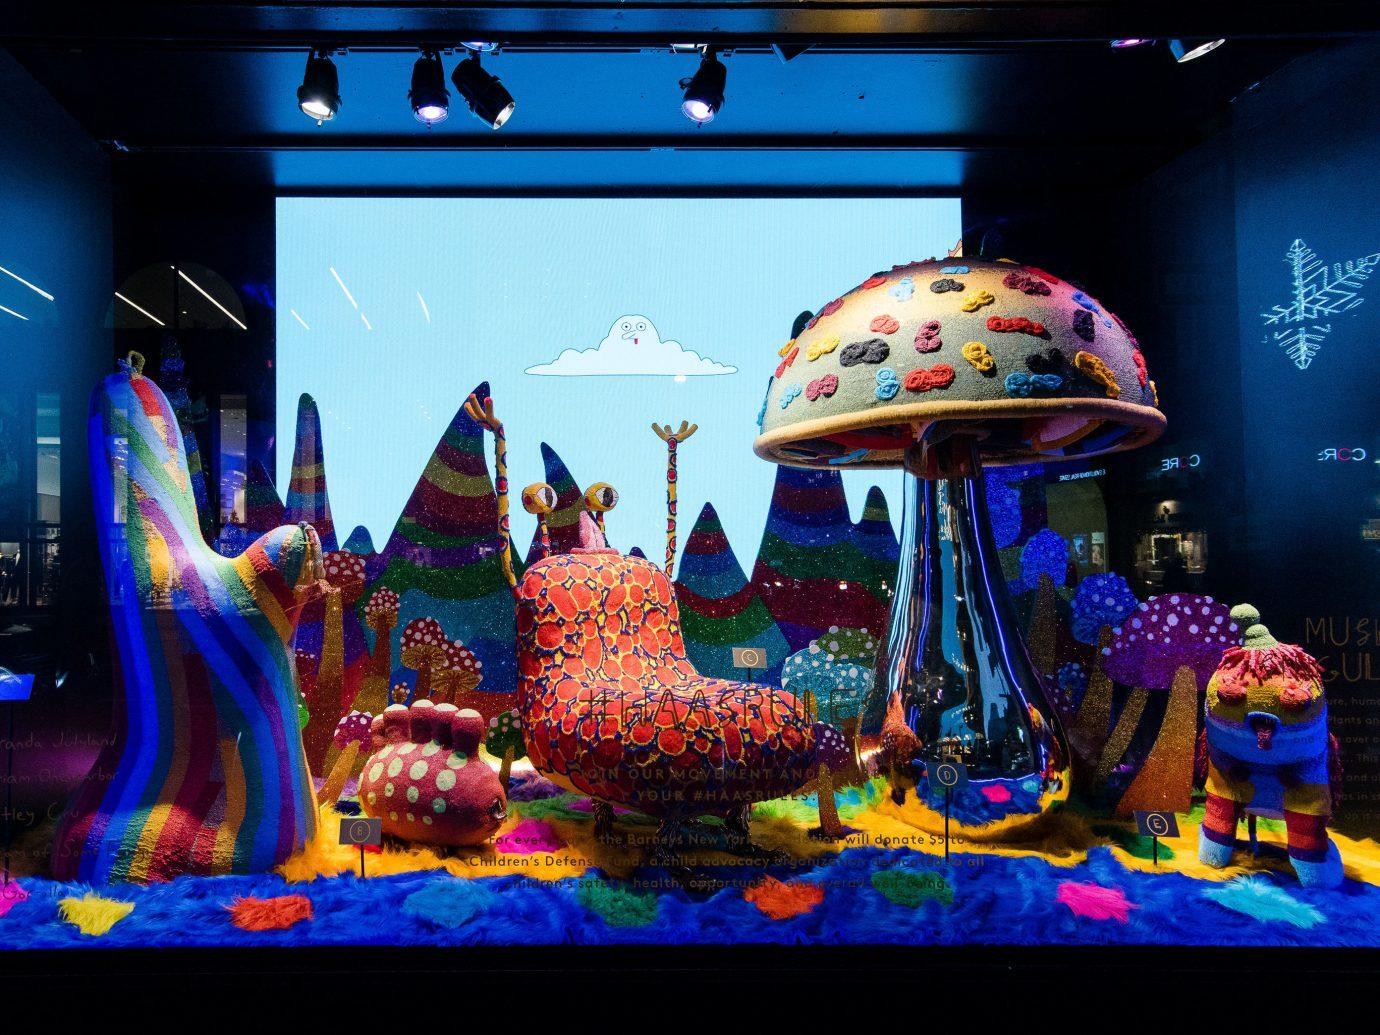 Offbeat Winter indoor fun art computer wallpaper blue colorful colored